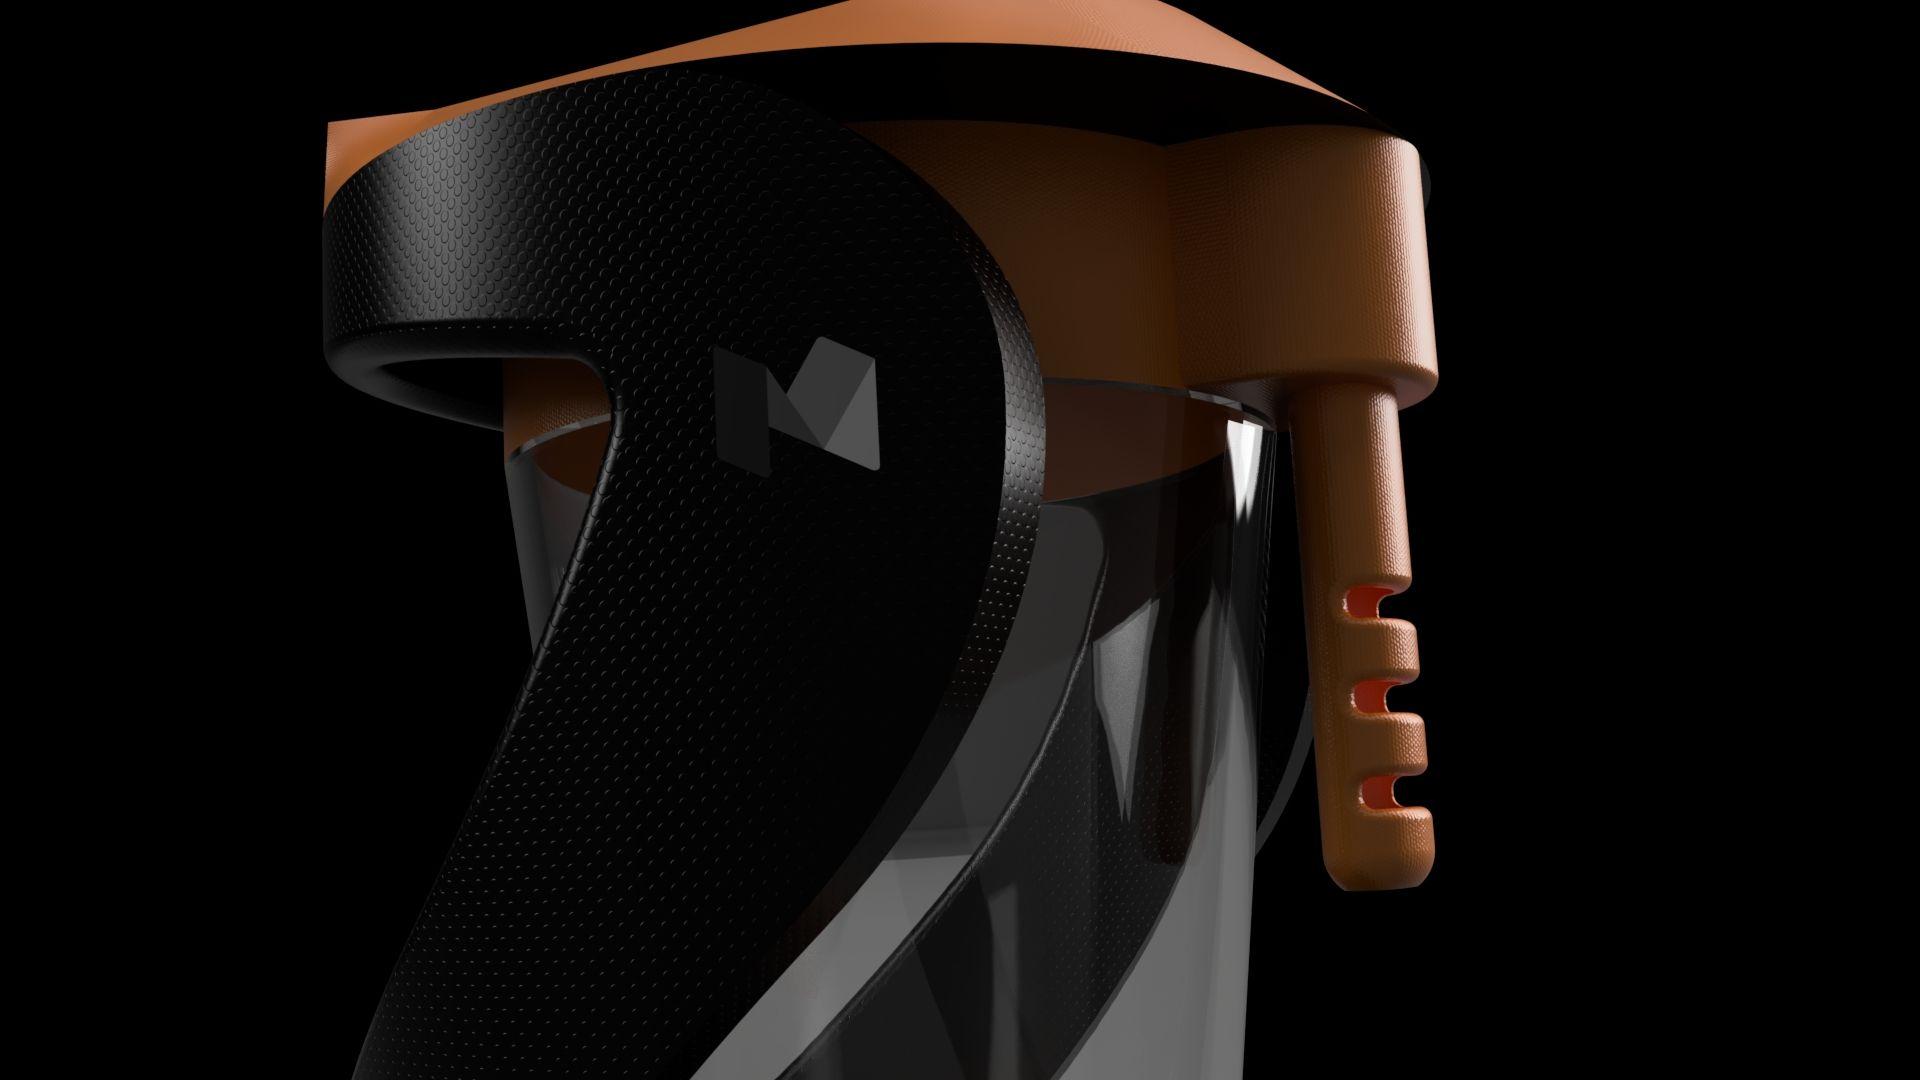 Liq-design-lcs2018-fabrica-de-nerdes-6-3500-3500